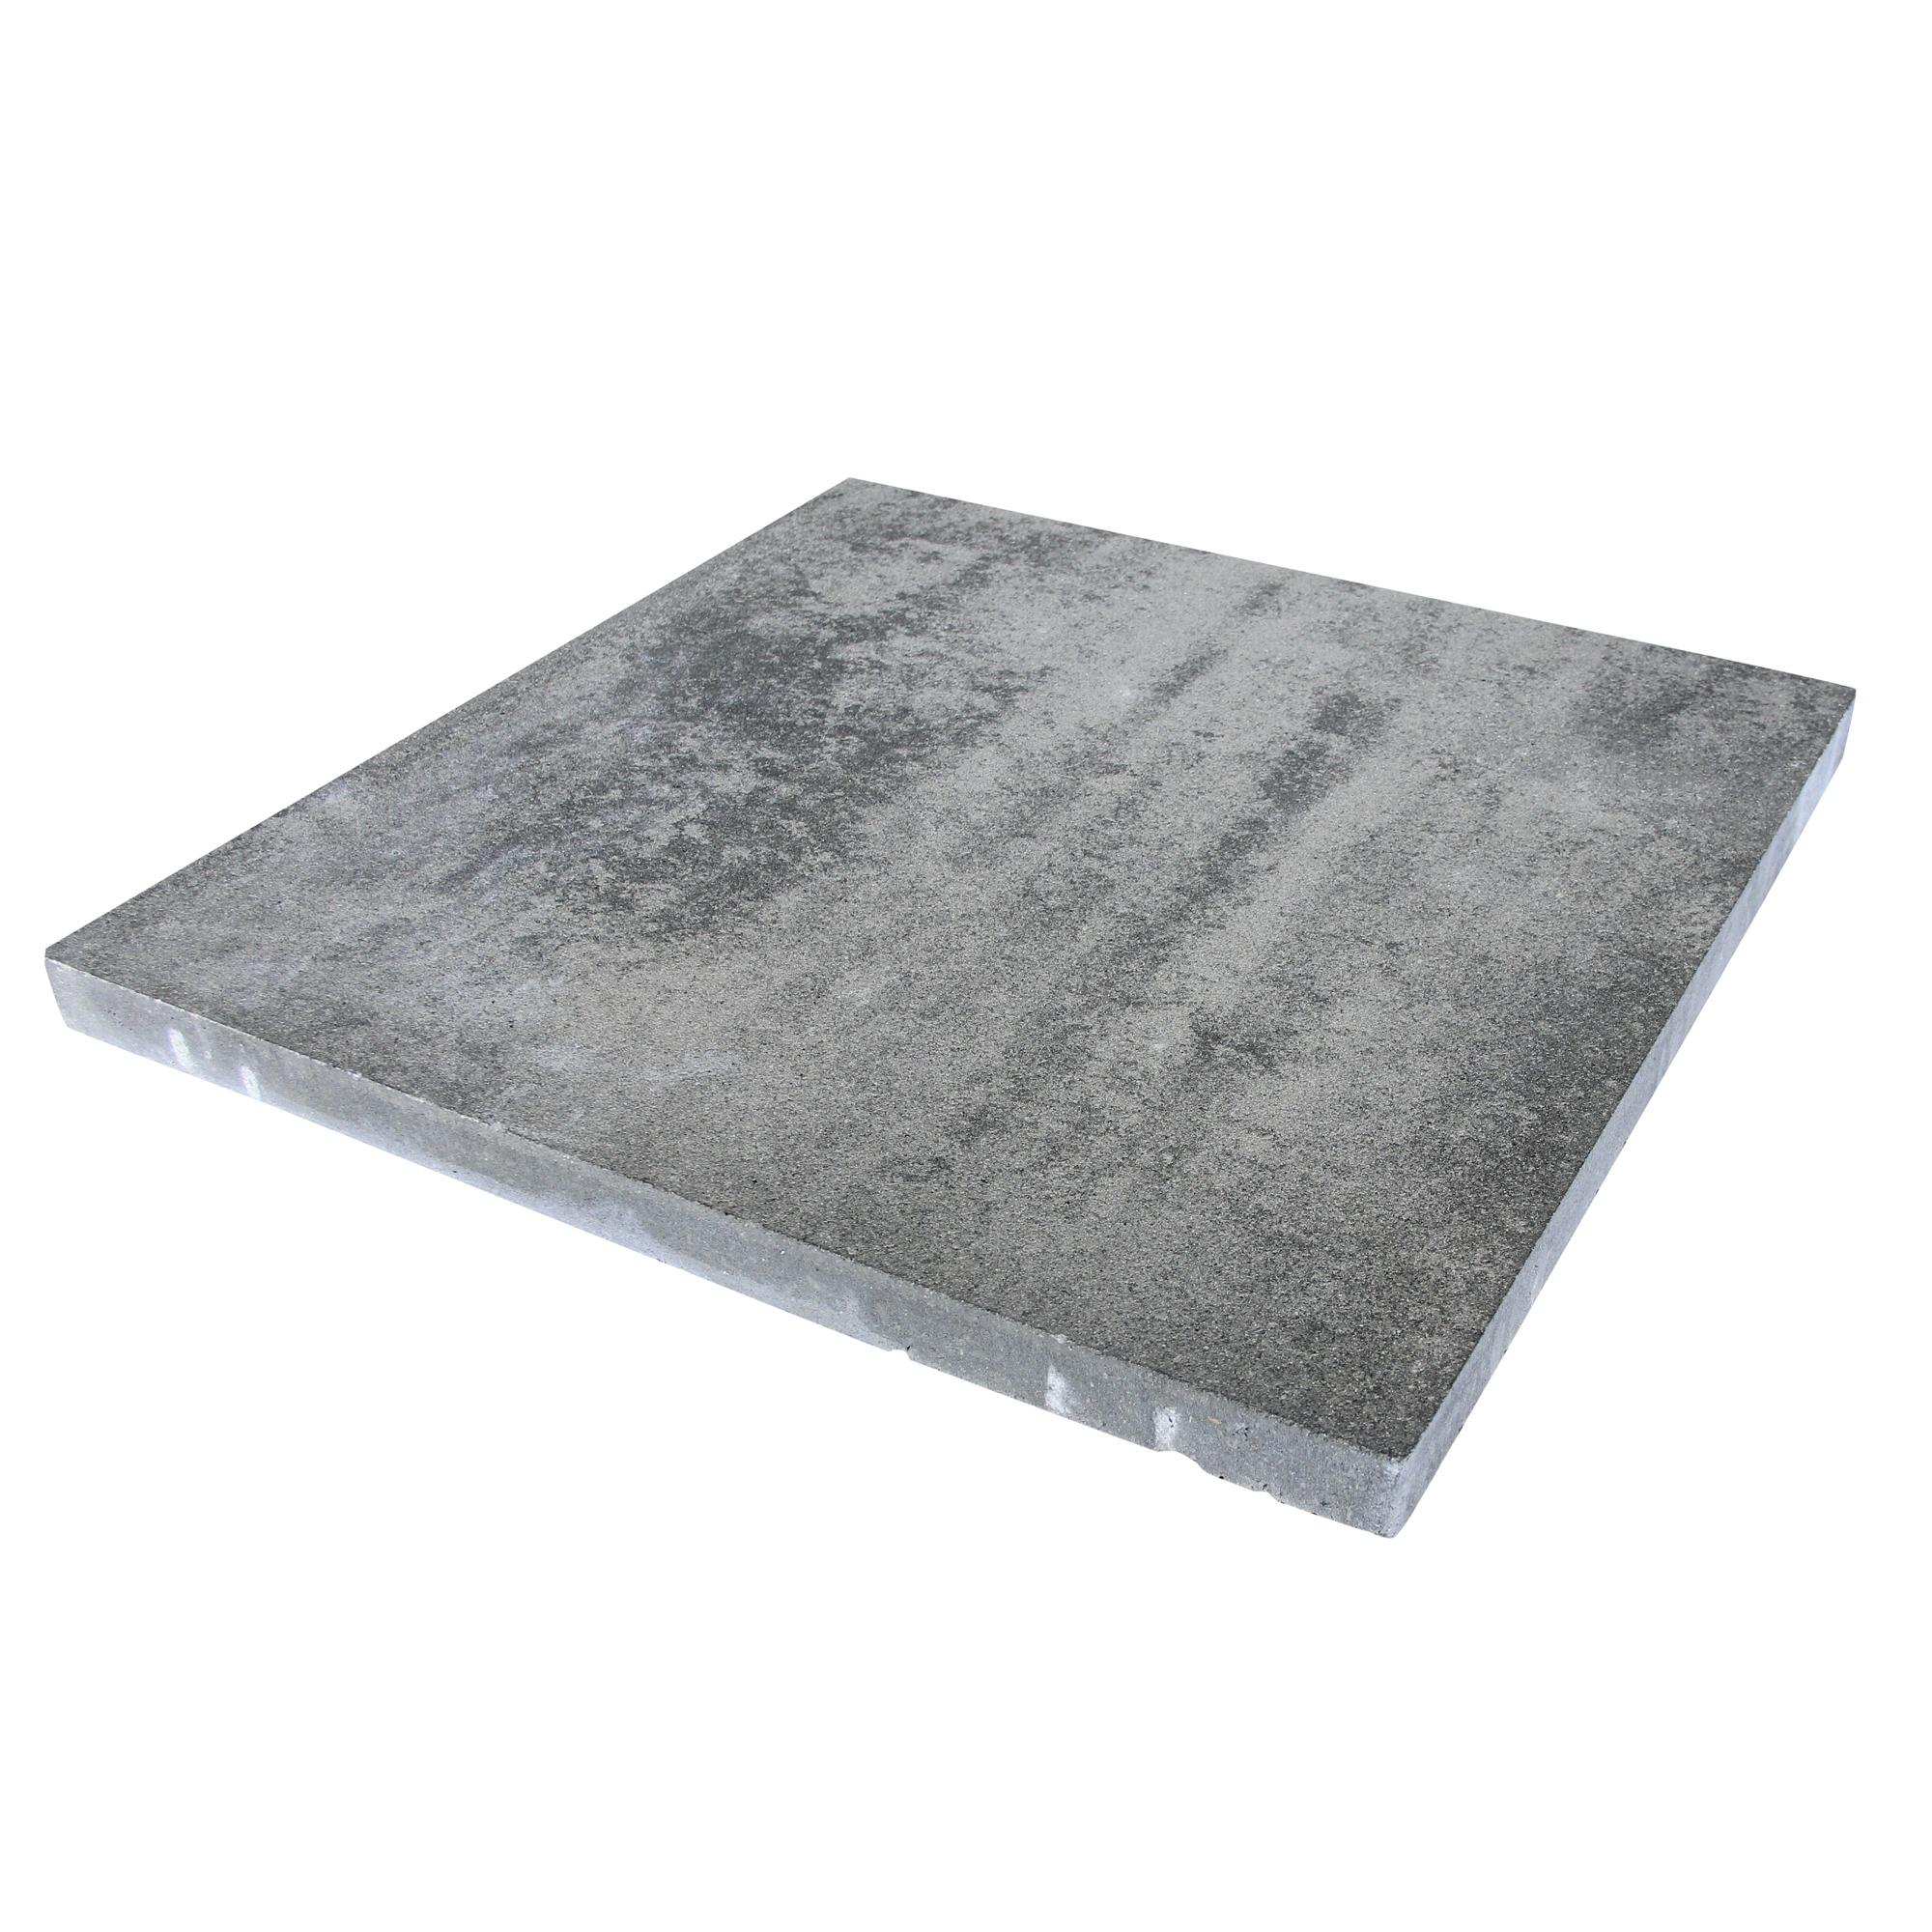 Terrastegel Beton Vegas Grijs 60x60 cm 36 Tegels-12,96 m2